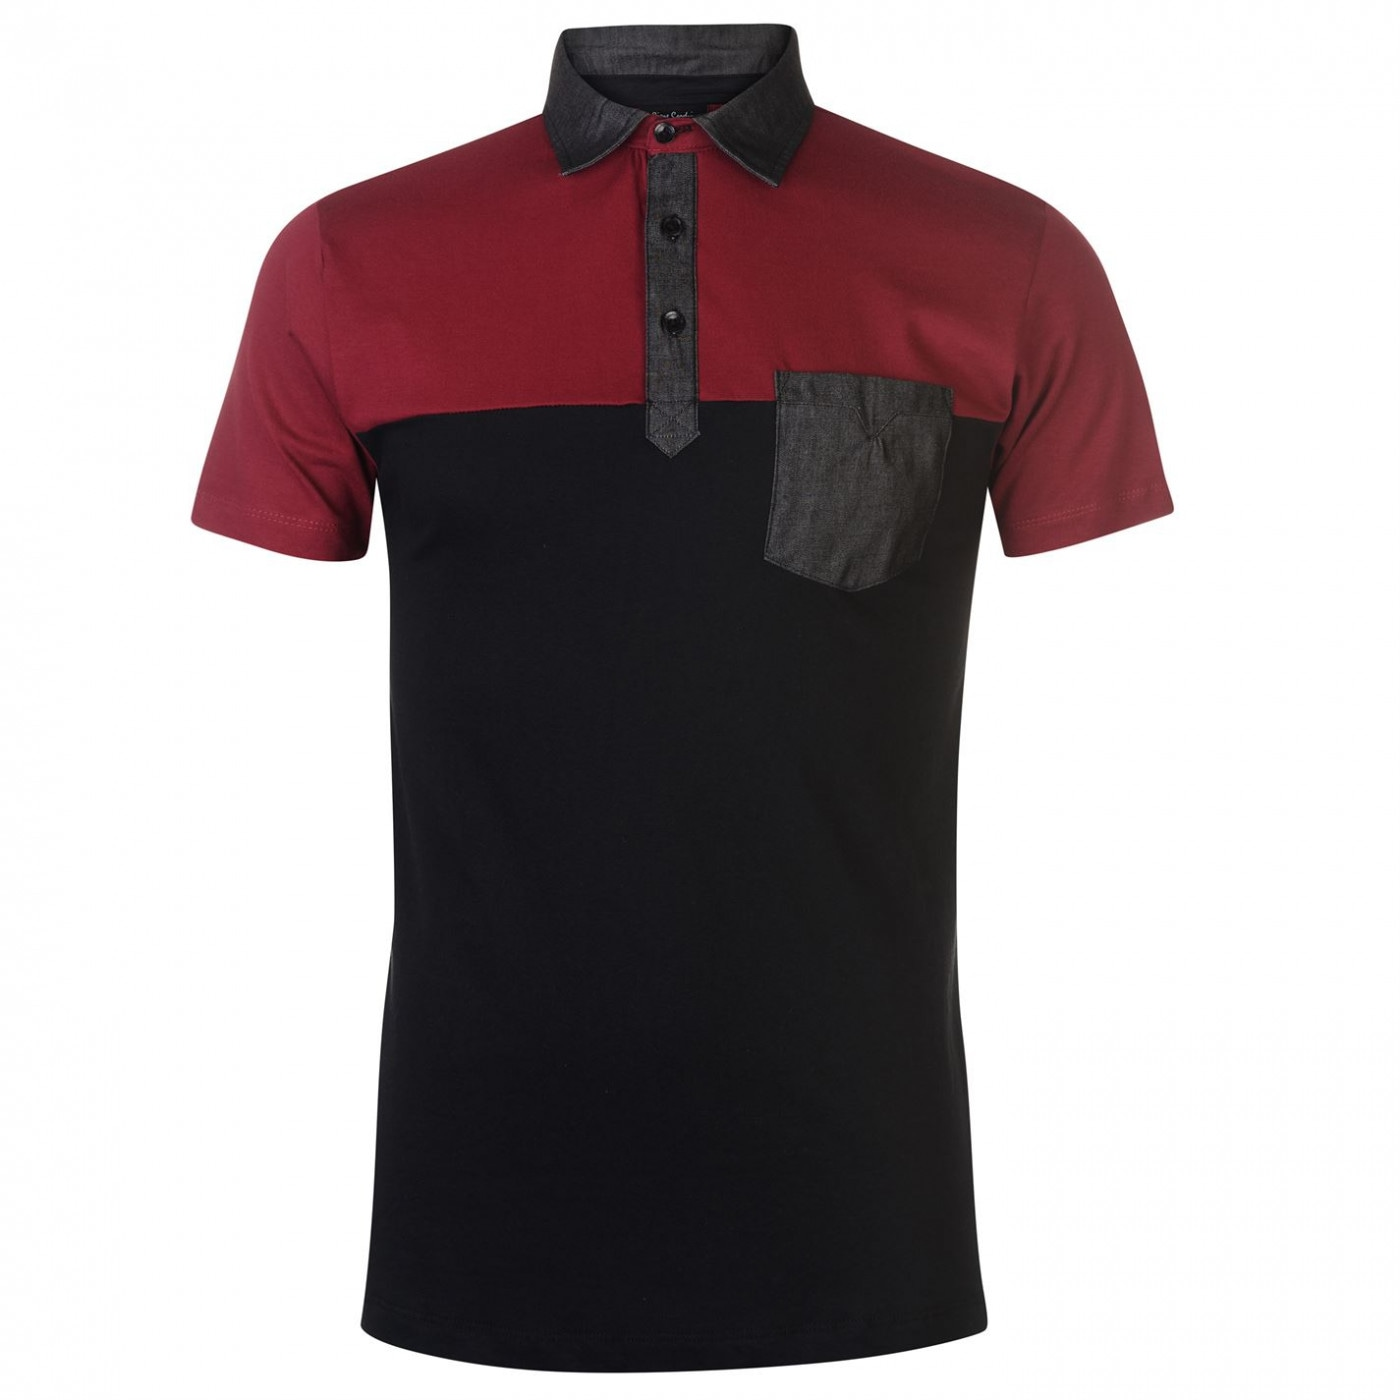 801d775bfc2b Pierre Cardin Colour Block Polo Shirt Mens - FACTCOOL